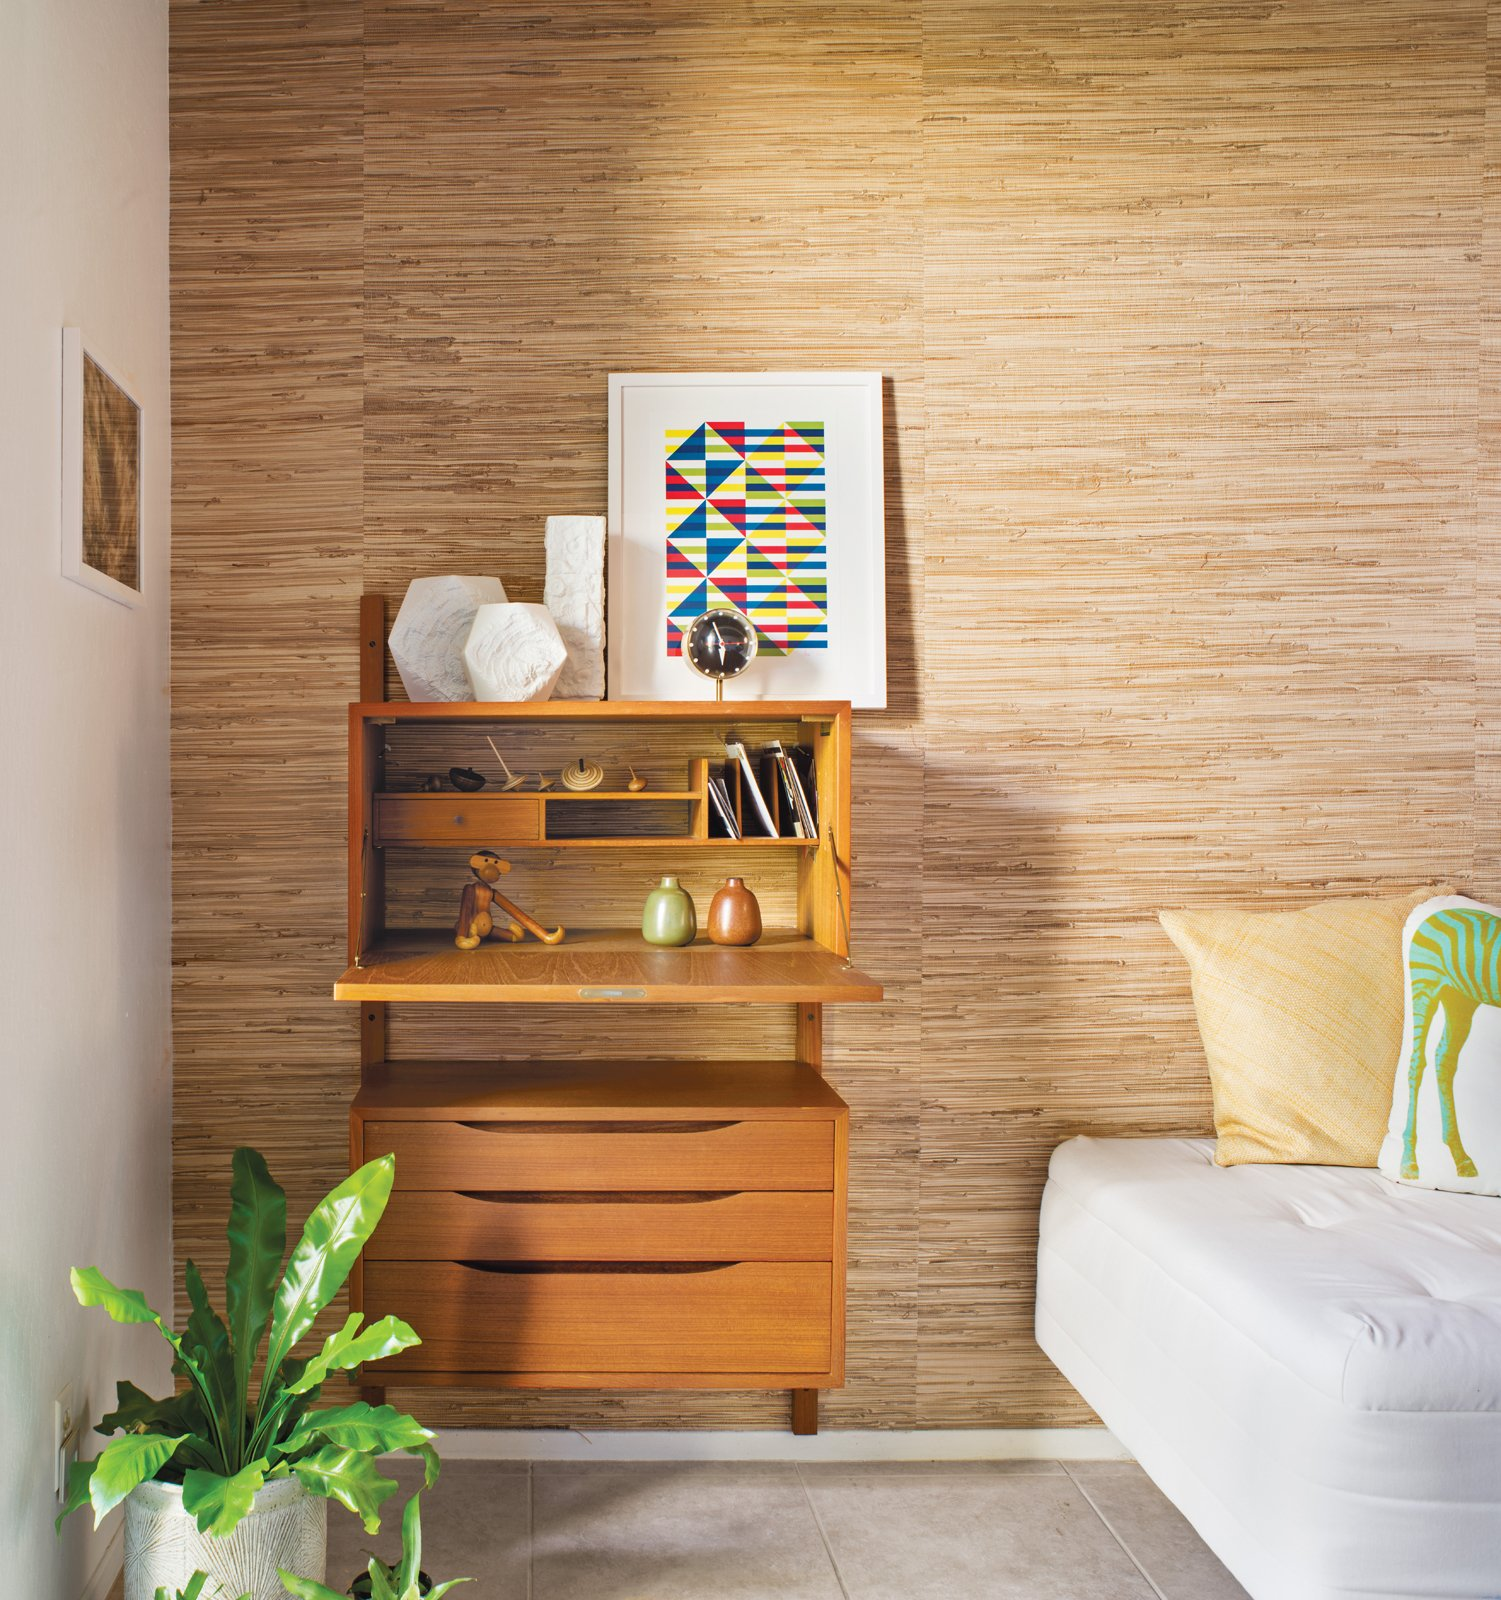 #midcenturymodern #office #smallspaces #bedroom #desk   Photo 40 of 42 in Wallpaper That Fixes Walls